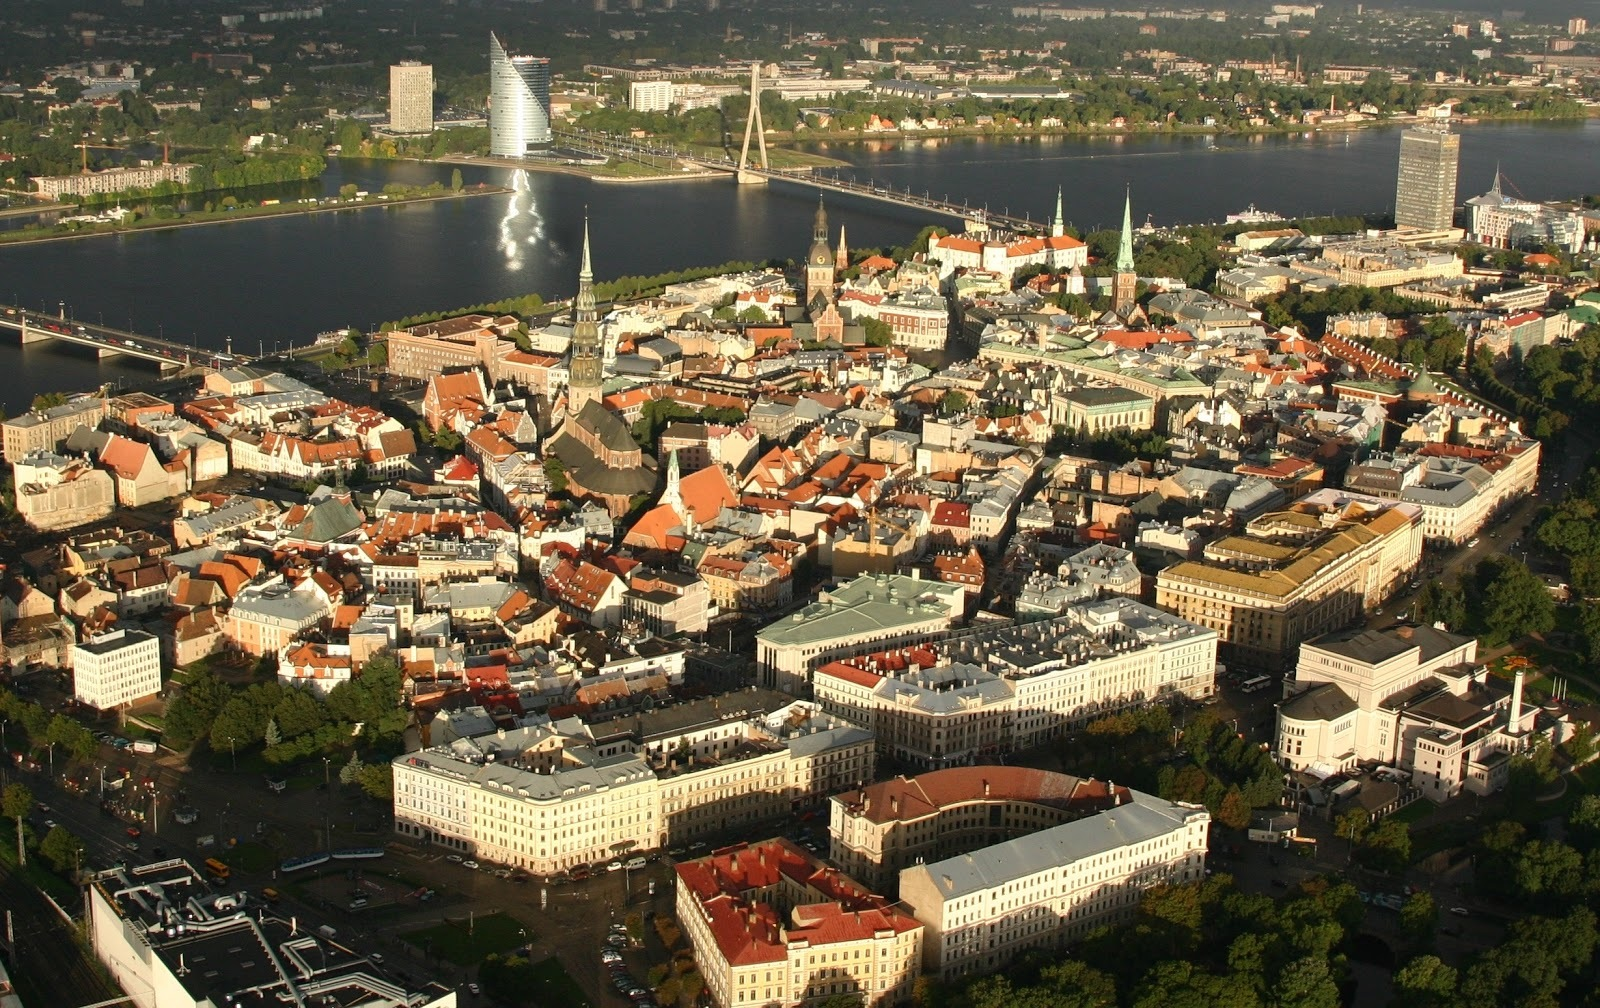 A bird's eye view of Old Riga, Latvia